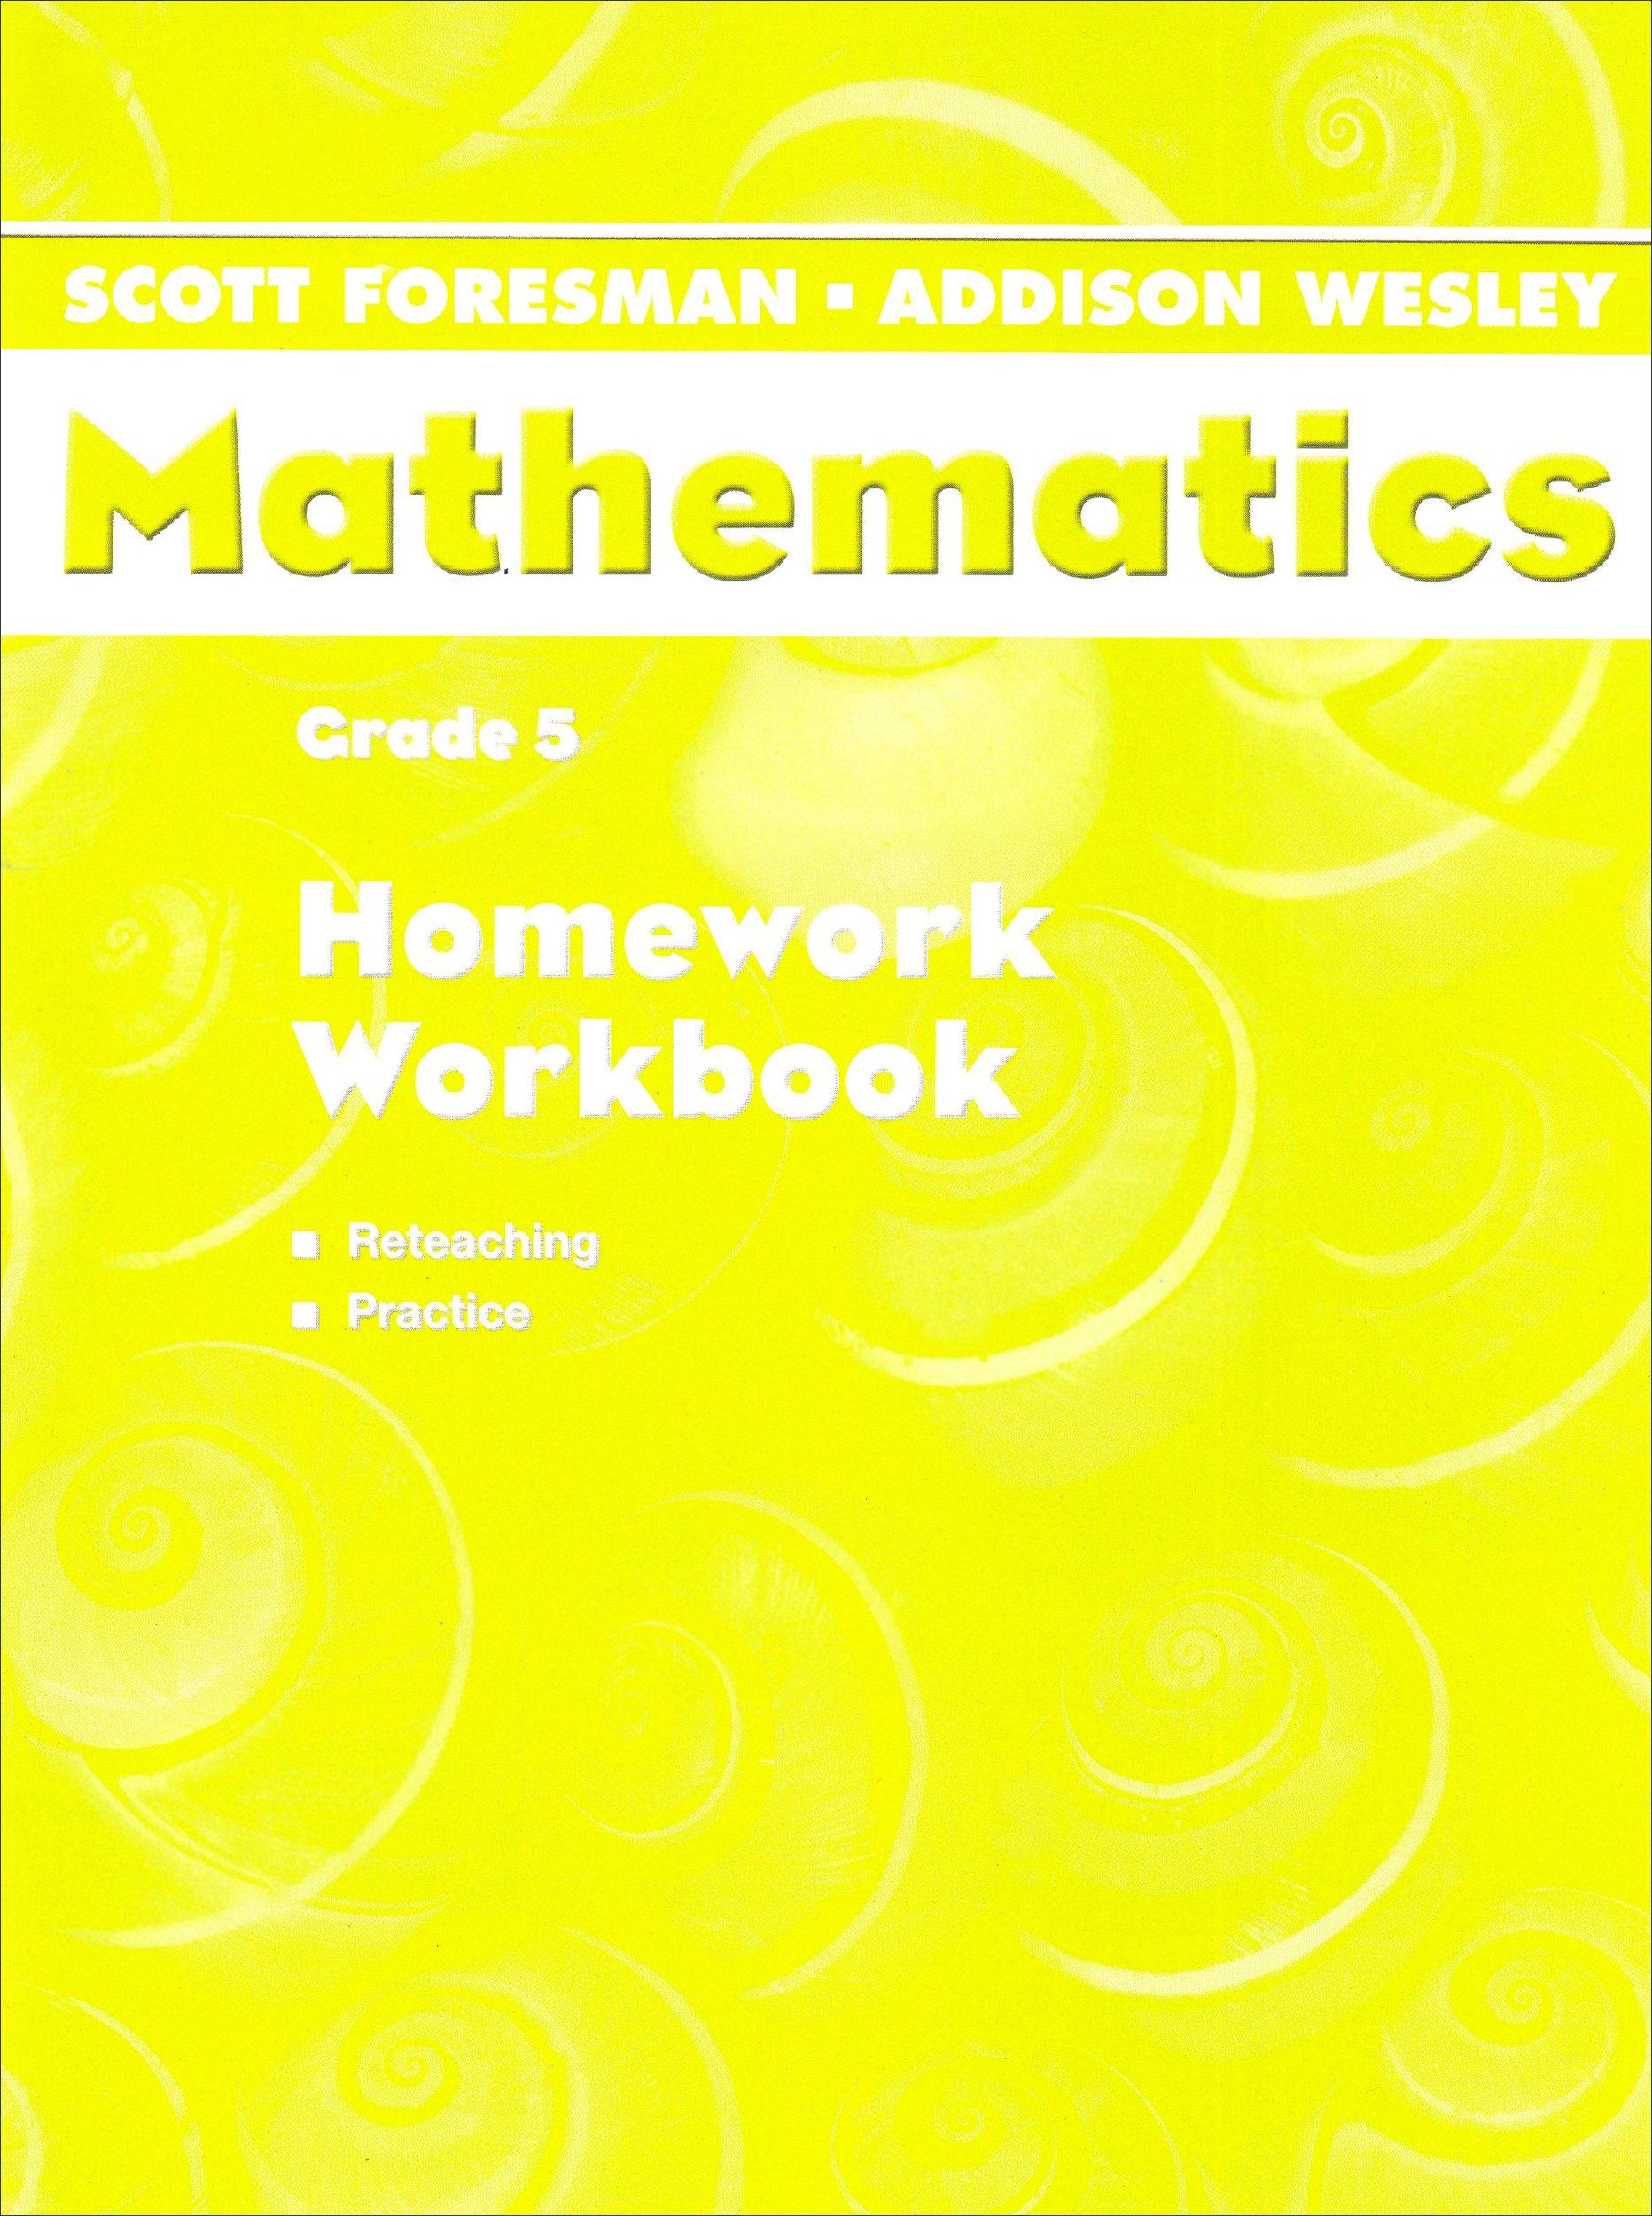 Scott Foresman Addison Wesley Math 2004 Homework Workbook